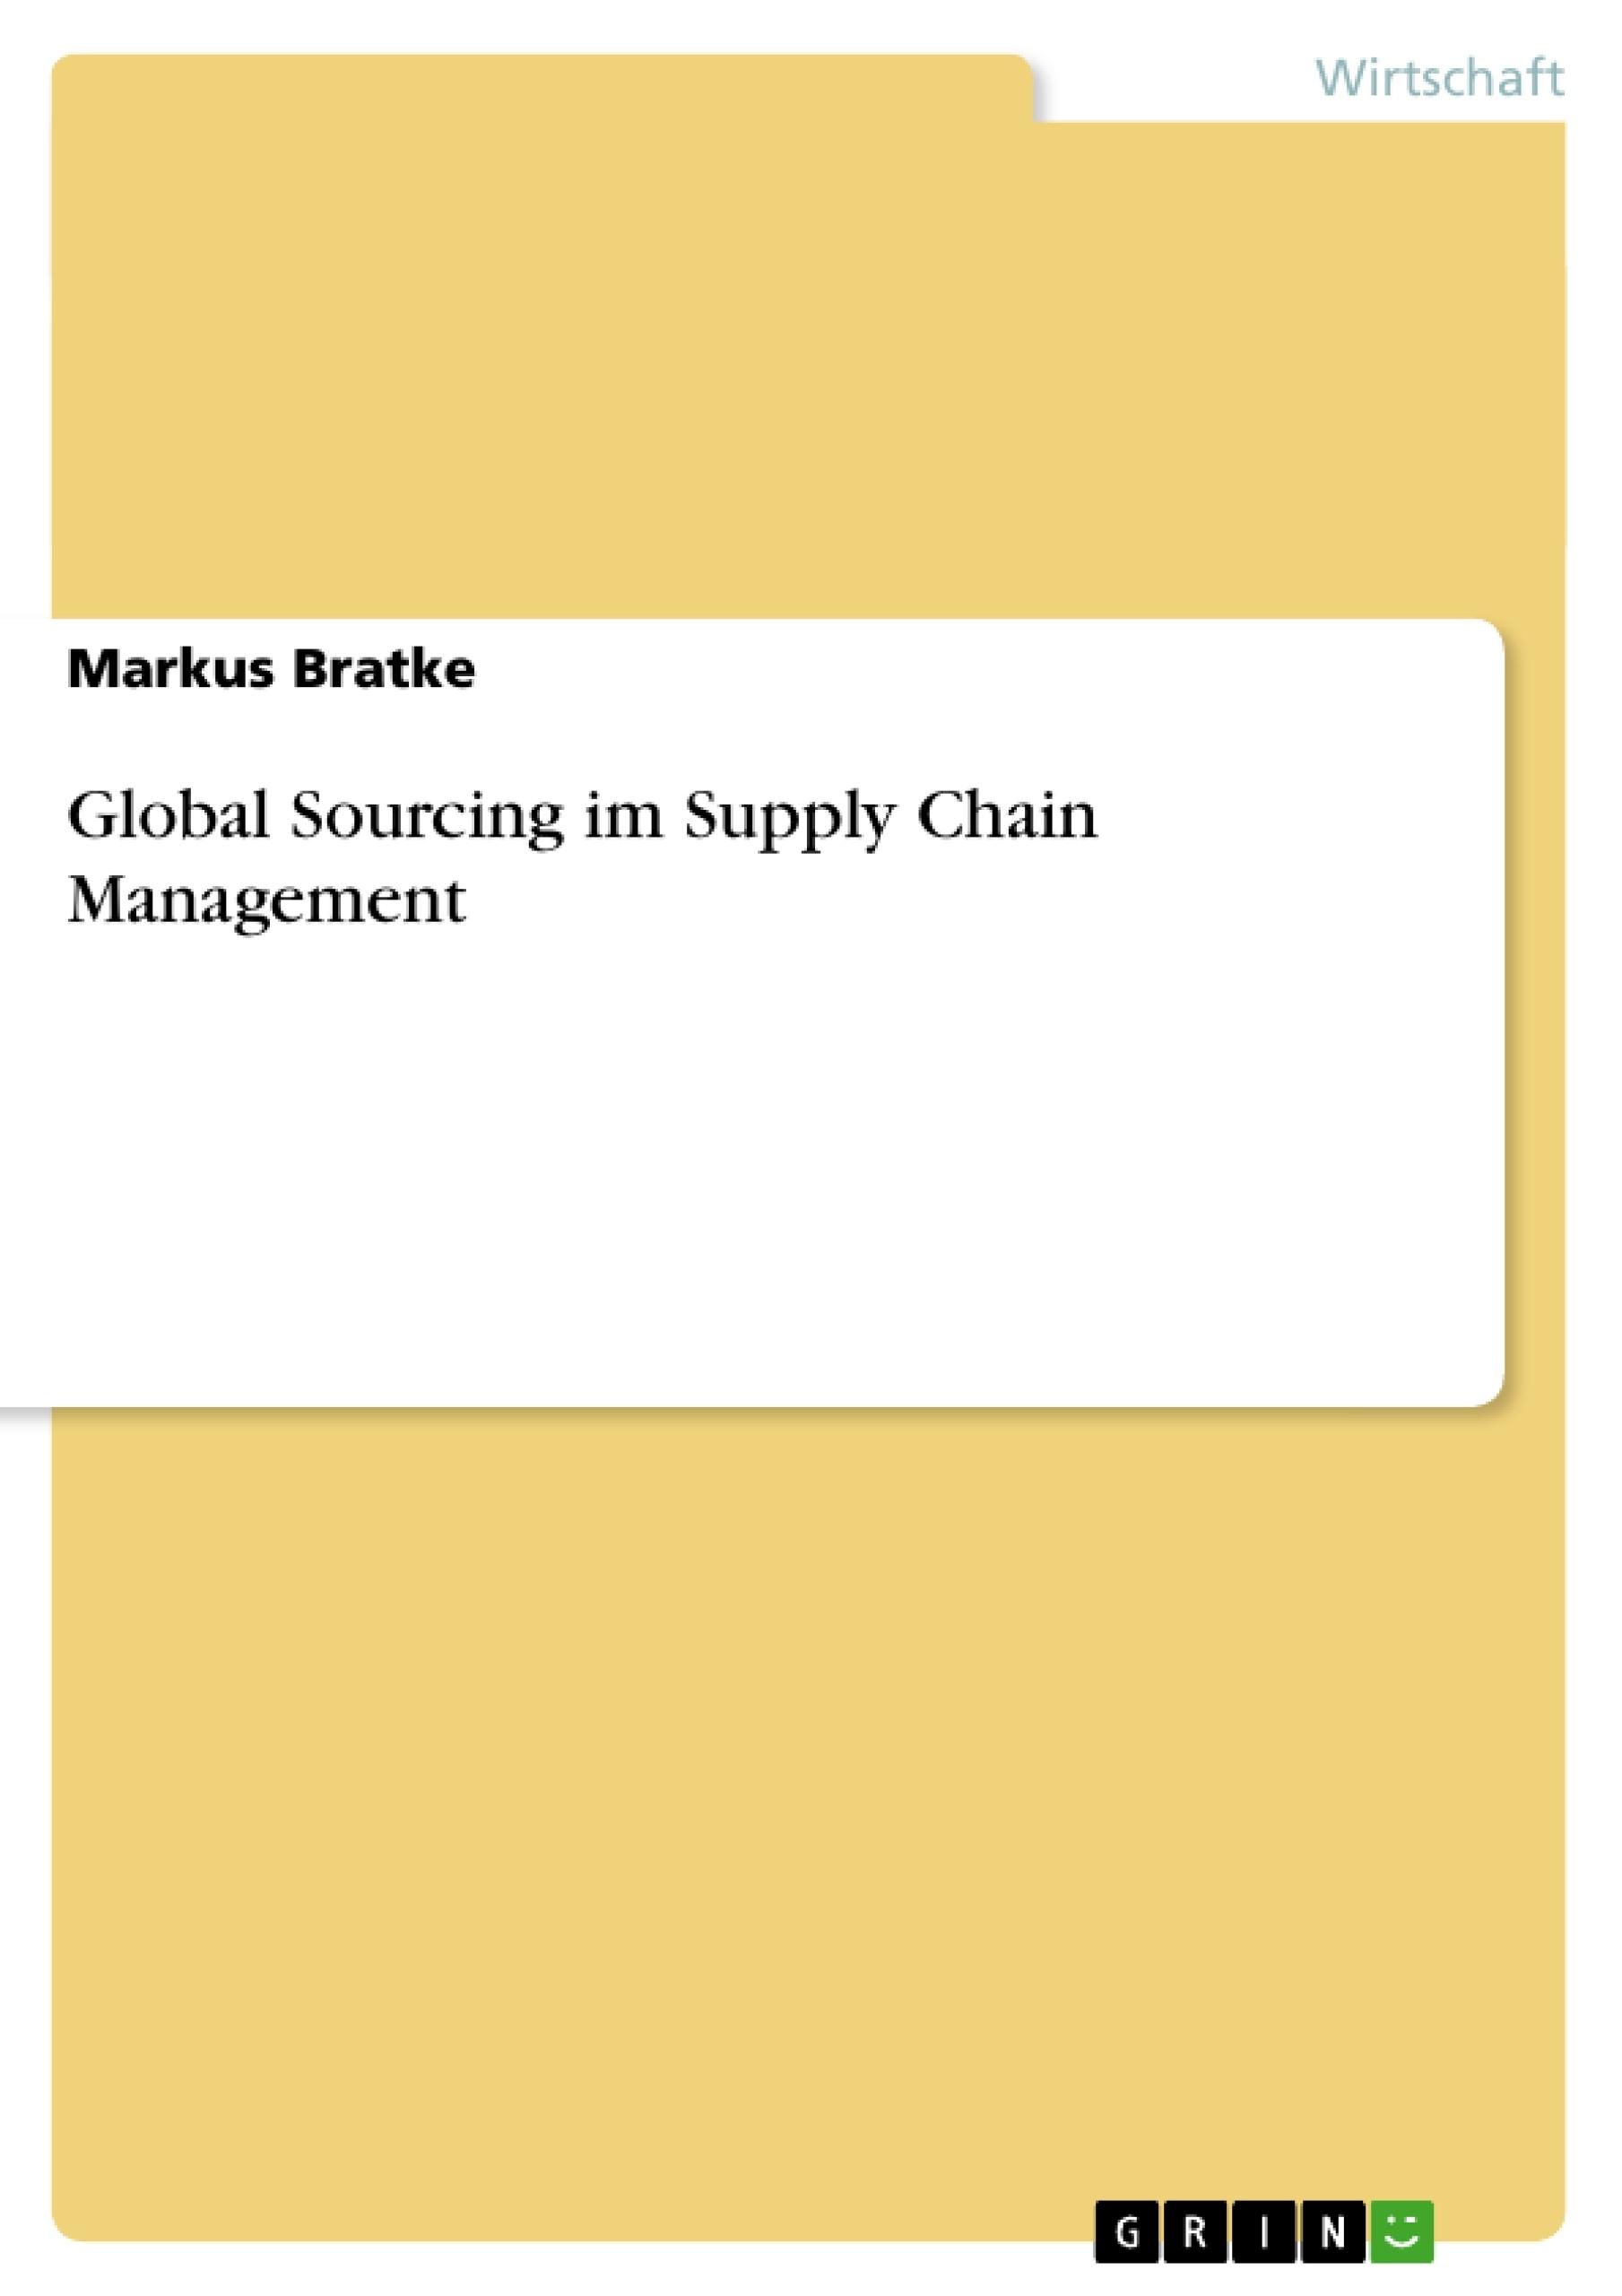 Titel: Global Sourcing im Supply Chain Management